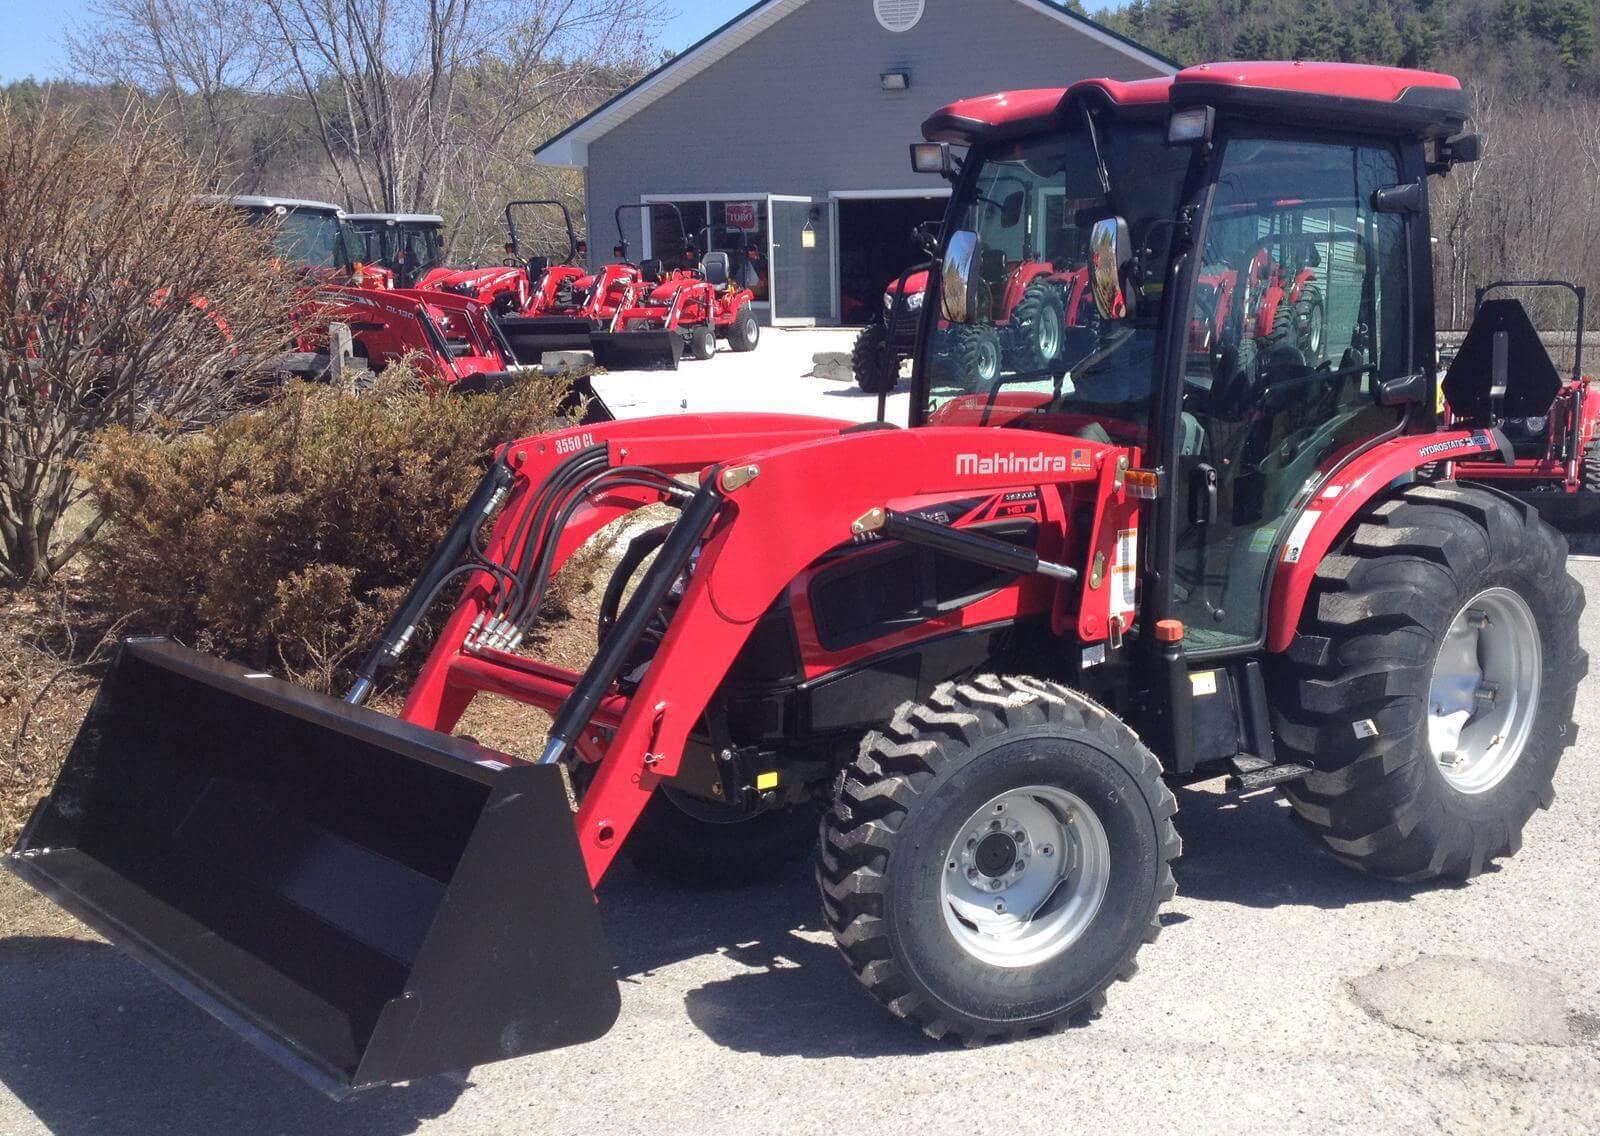 Mahindra 3550 4WD PST Cab tractor